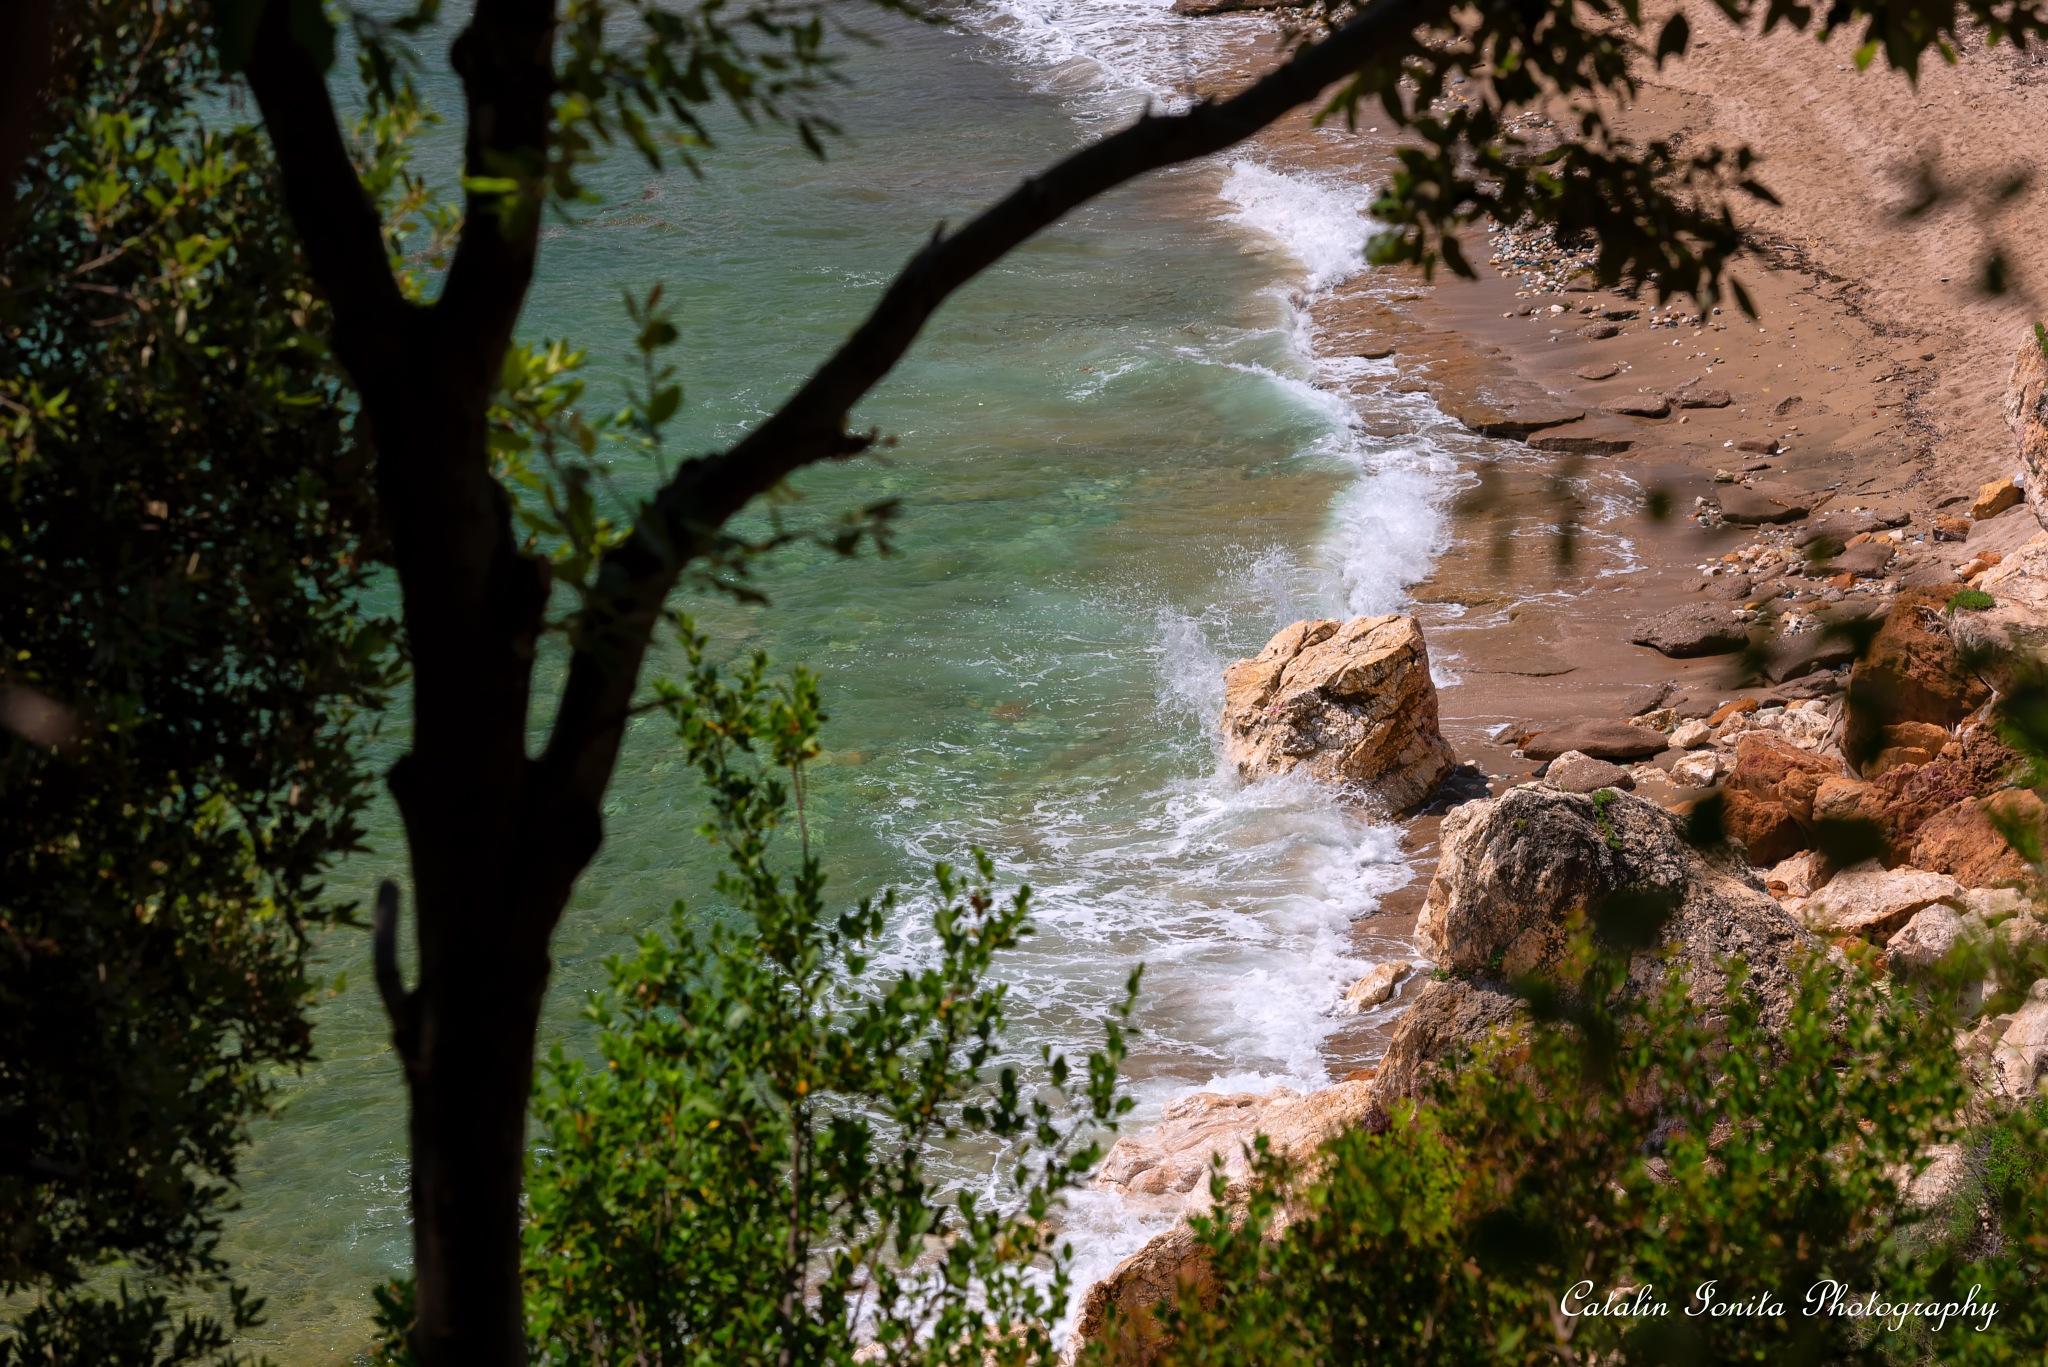 Photo in Landscape #thessaly #greece #greek #grecia #elada #holiday #travel #seascape #seashore #landscape #beach #aegean #aegean sea #volos #paltsi #potistika #pelion #pilion #eastern pelion #travel photography #travel photographers #green #forest #wild greece #wild beach #vlahos #vlahos2003 #vlahos 2003 #fotograf catalin ionita #fotografie catalin ionita #catalin #catalin ionita #catalin ionita photography #catalin ionita photographer #travel in greece